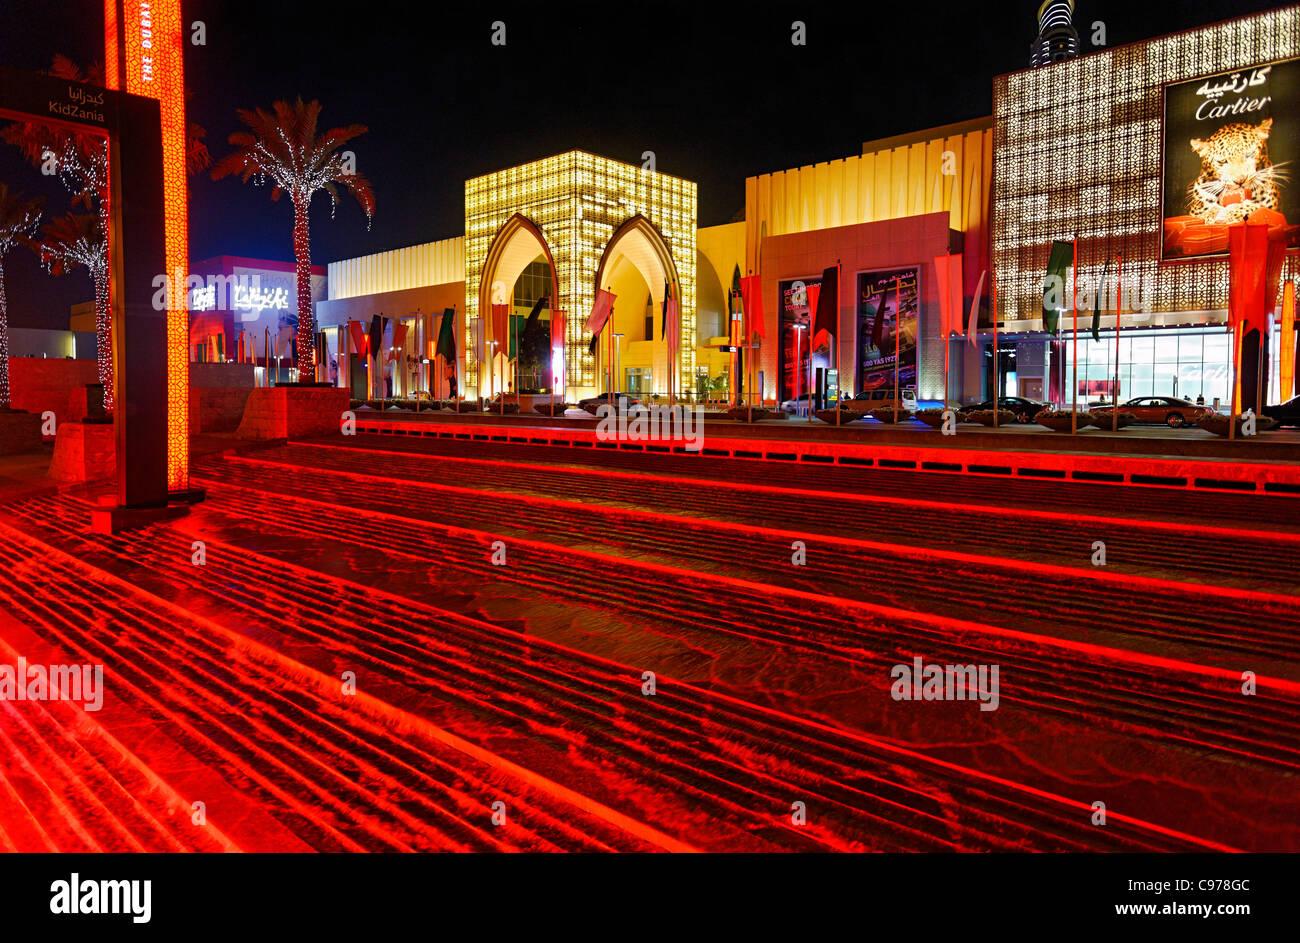 Main entrance of the DUBAI MALL, the world's largest mall, Downtown Dubai, Dubai, United Arab Emirates, Middle - Stock Image